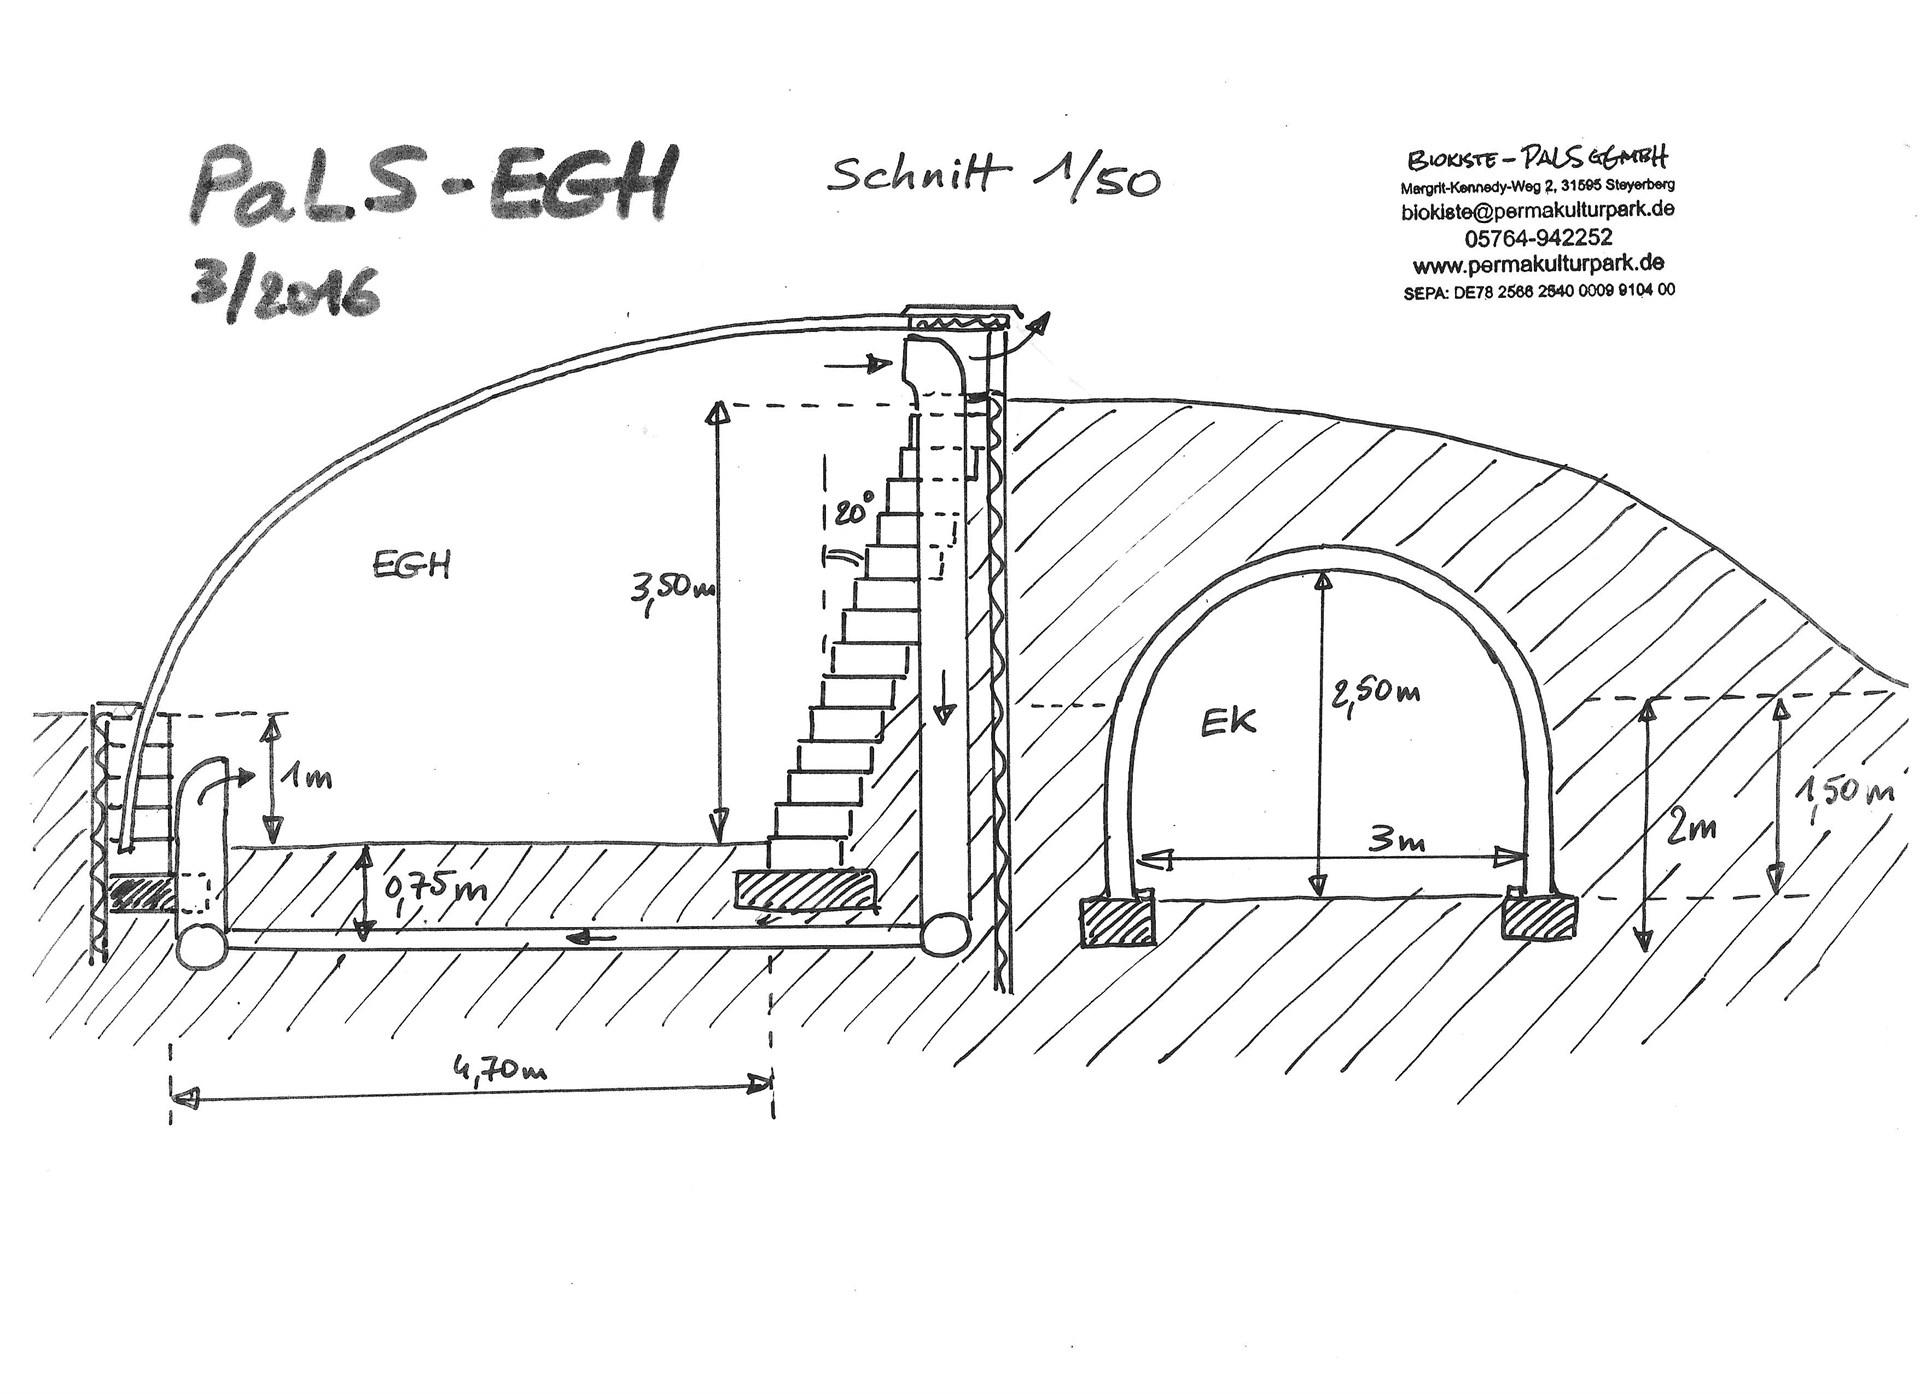 regenwasserversickerung selber bauen regenwasserversickerung terrassen berdachung selber bauen. Black Bedroom Furniture Sets. Home Design Ideas